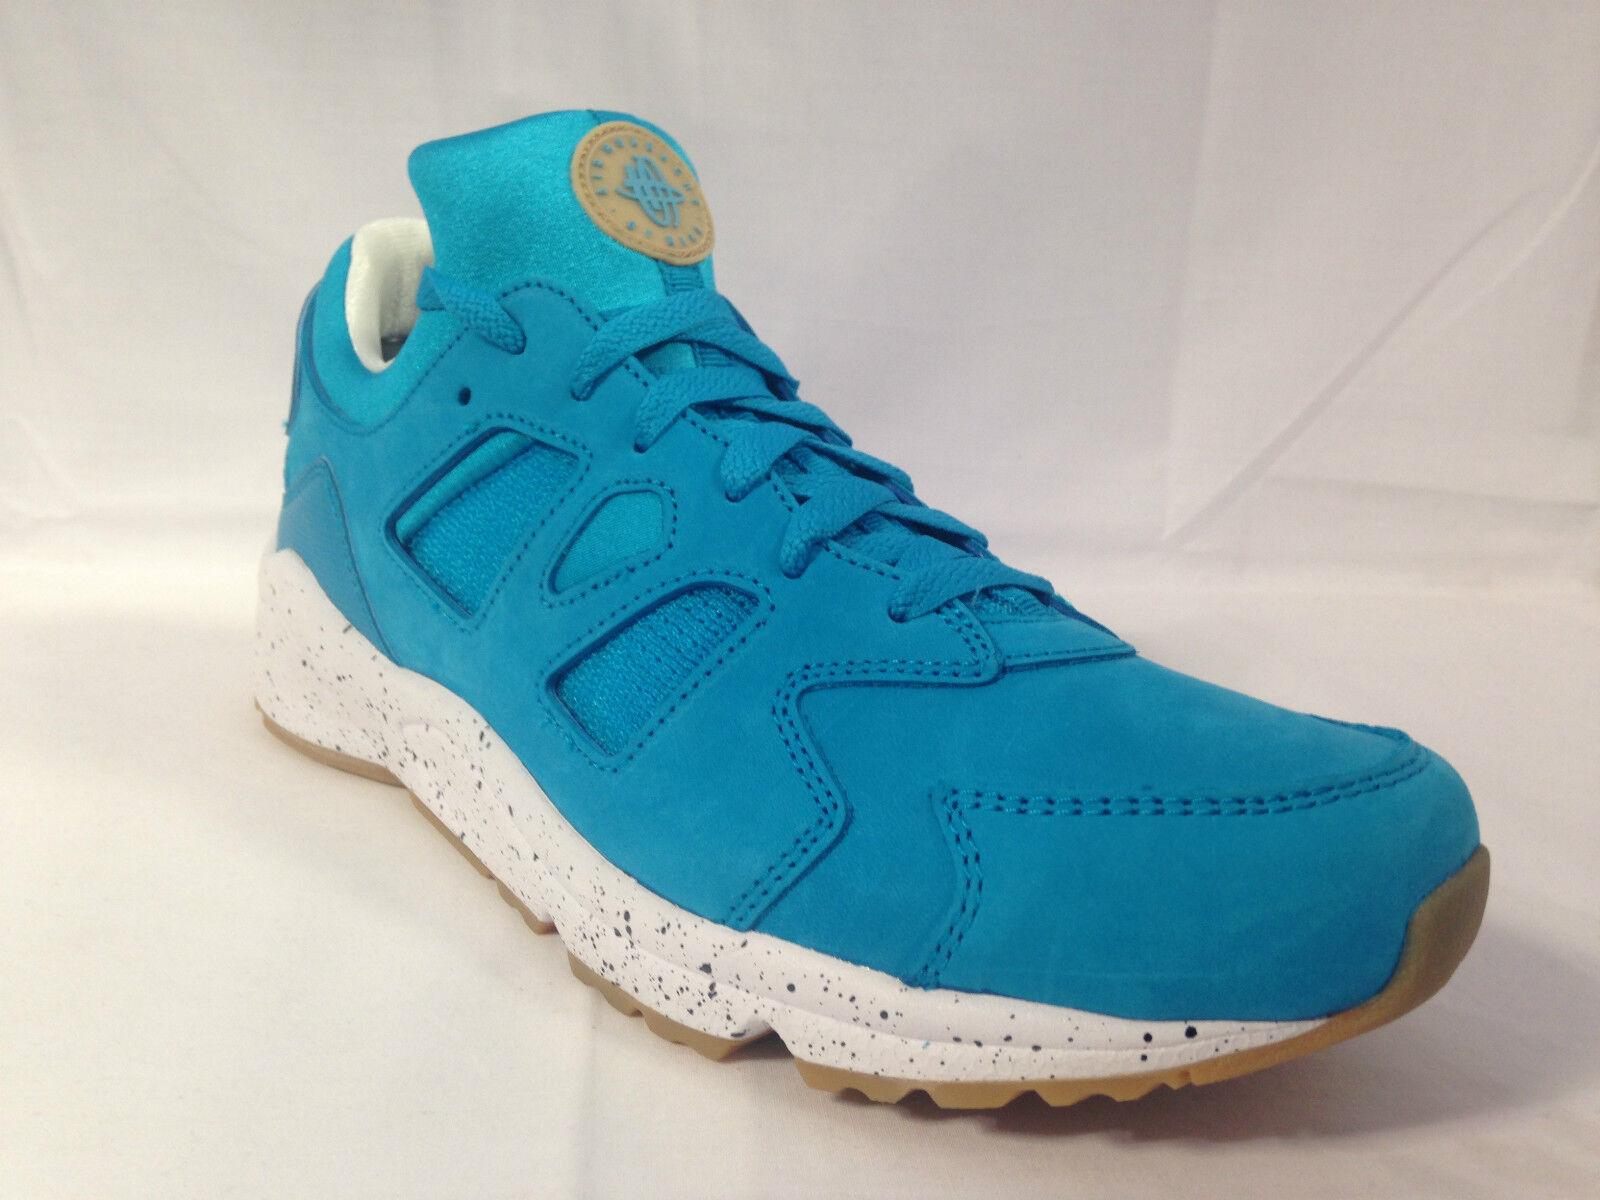 Nike Air Huarache International baby Bleu/speckle/gum 819482 400 tailles: uk 8.5 _ 9